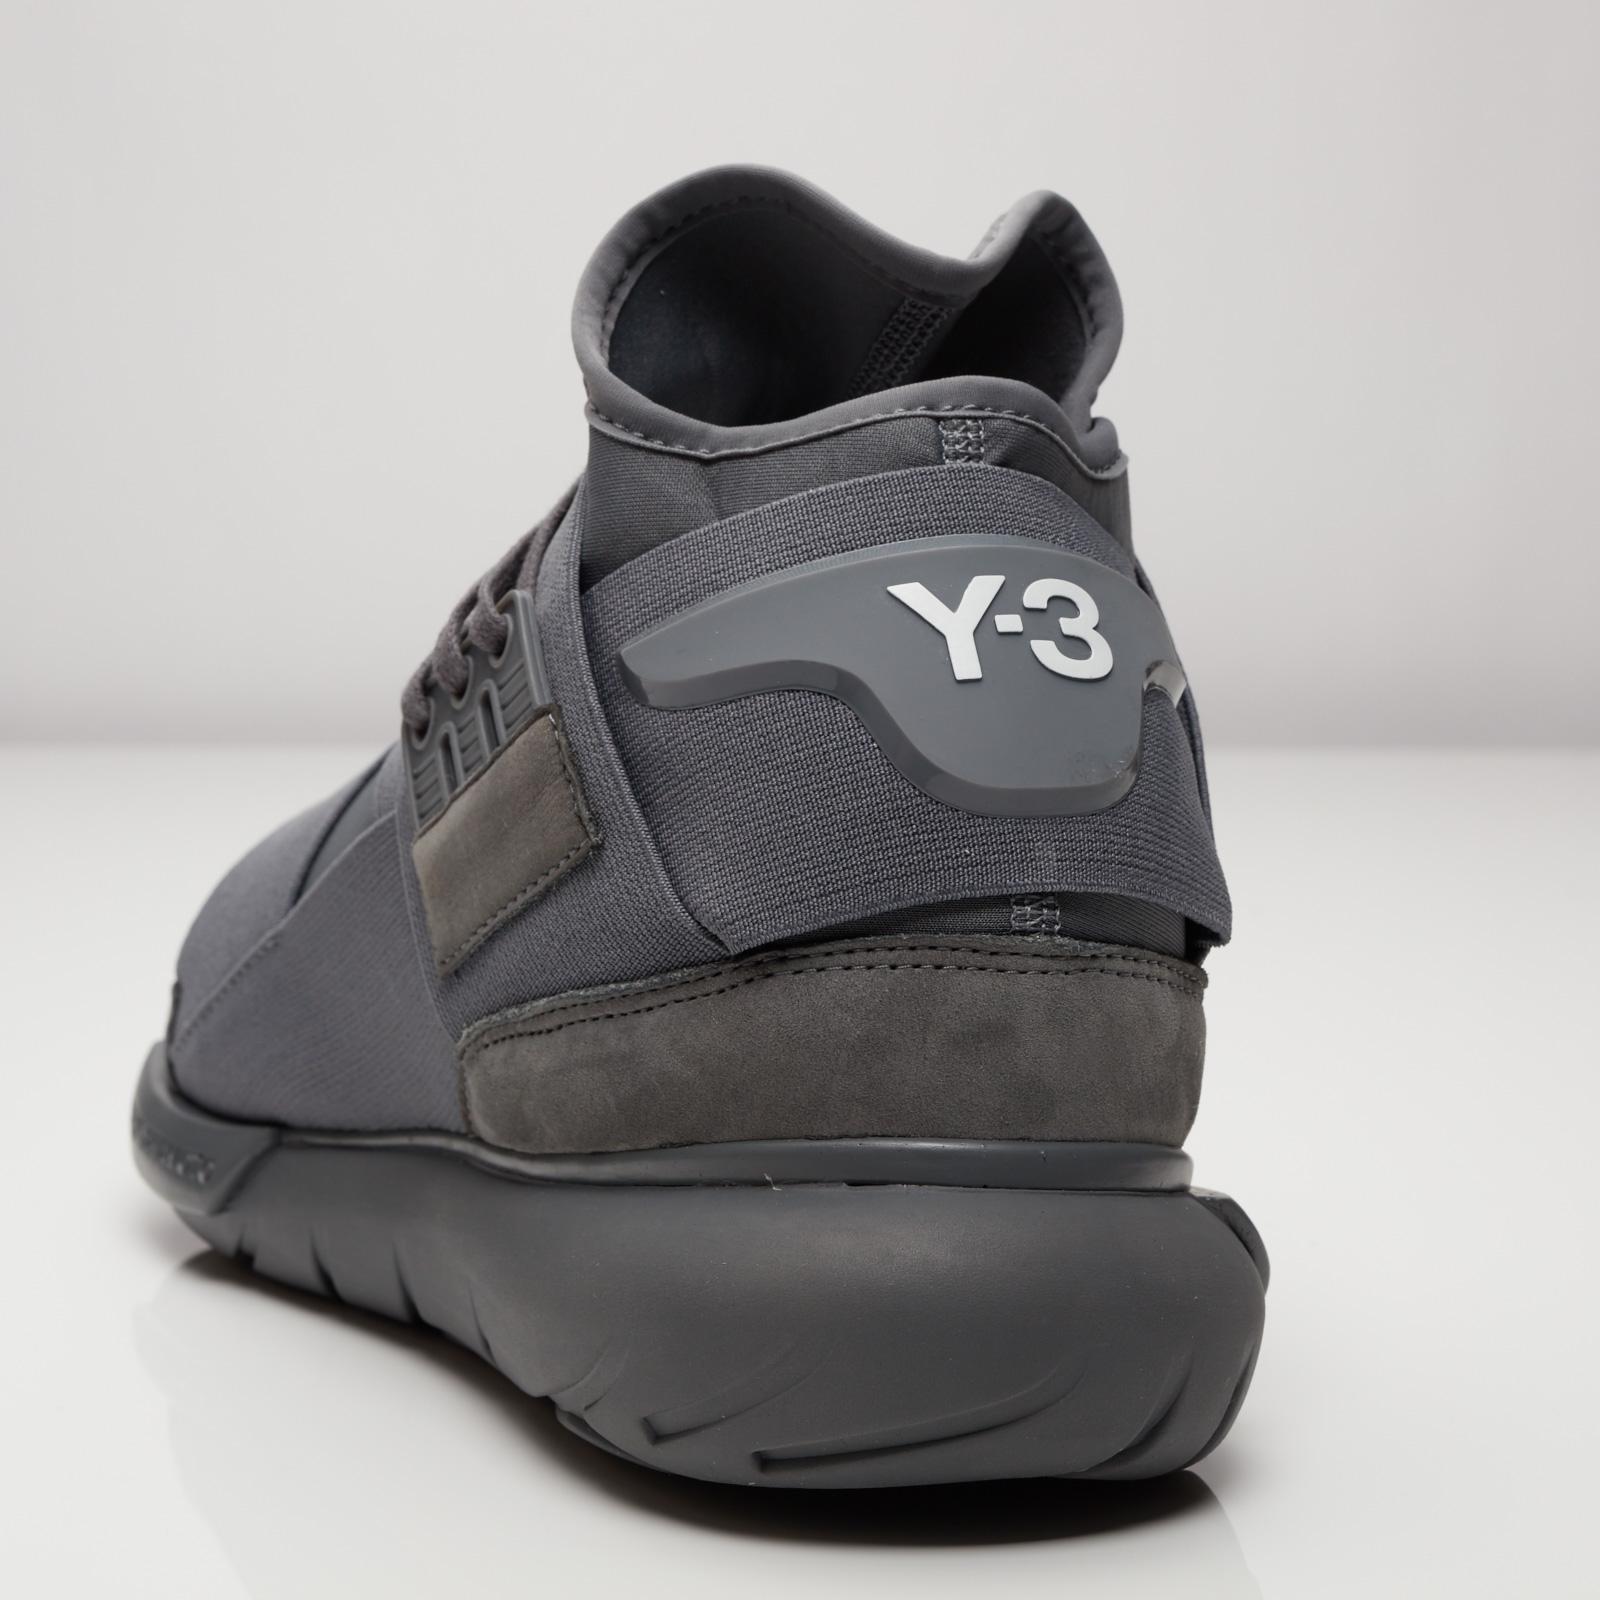 dbca438b53c07 adidas Y-3 Qasa High - Bb4734 - Sneakersnstuff